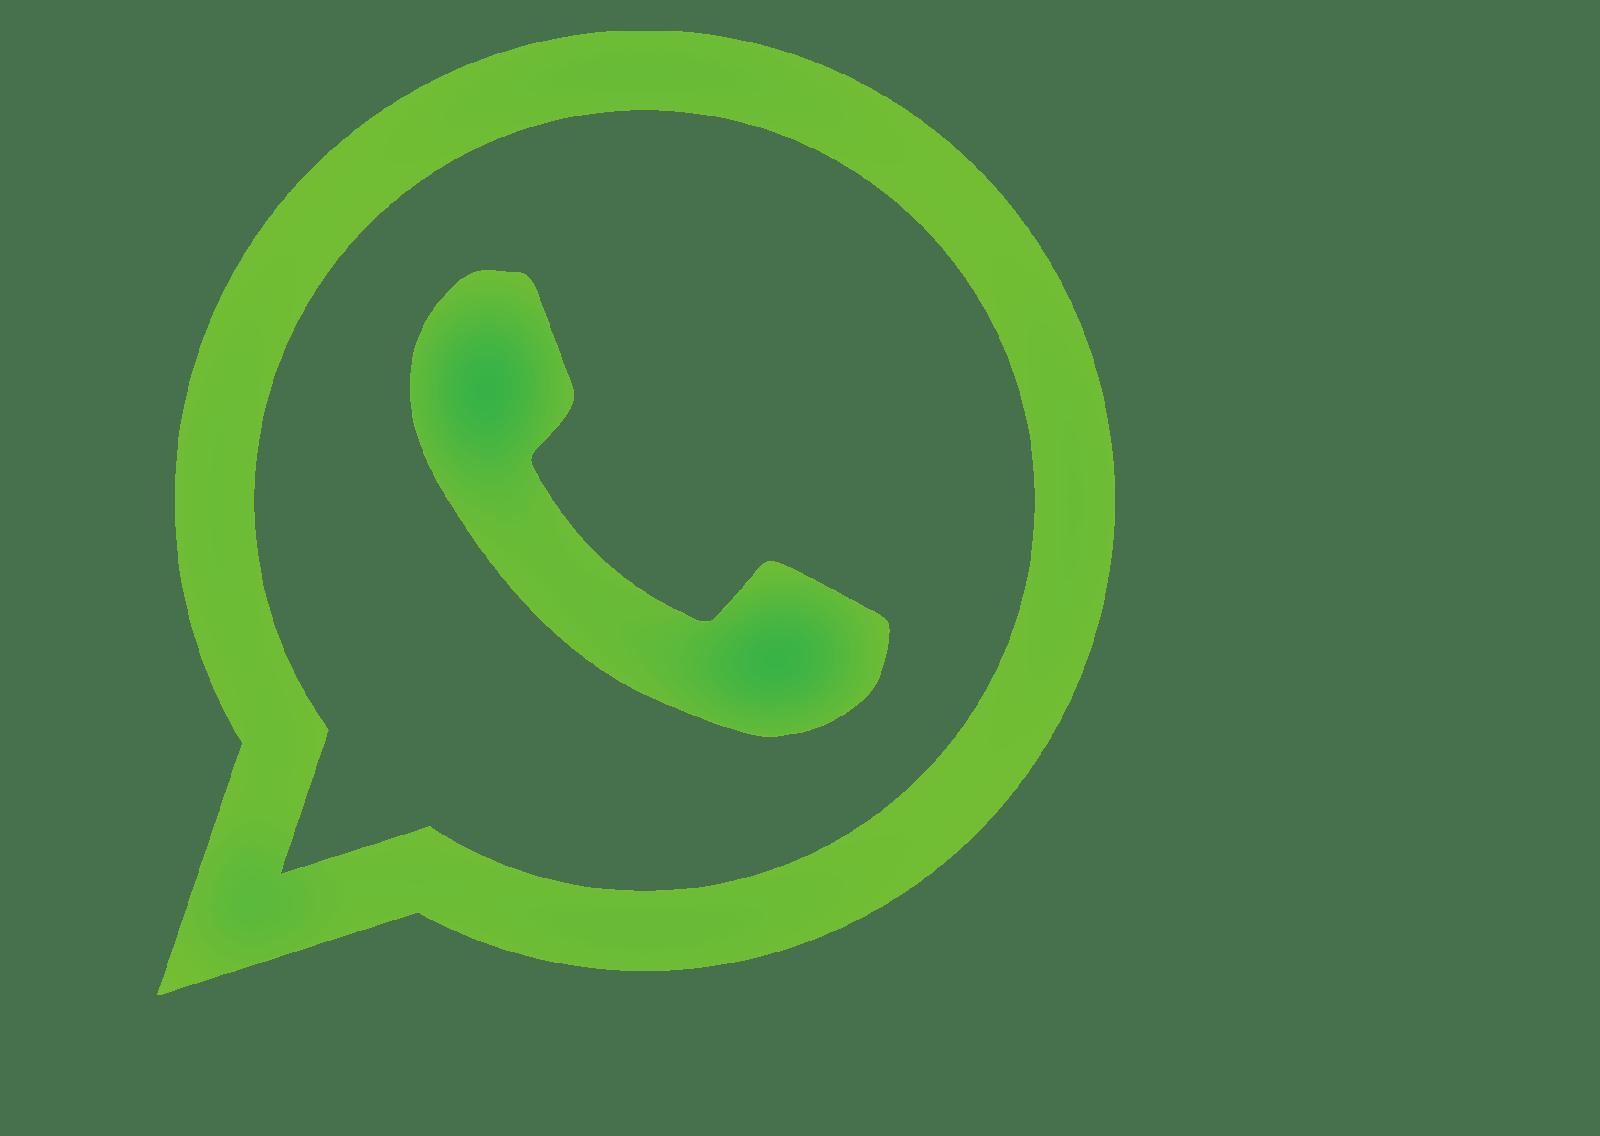 whatsapp png Pesquisa Google em 2020 Whatsapp png